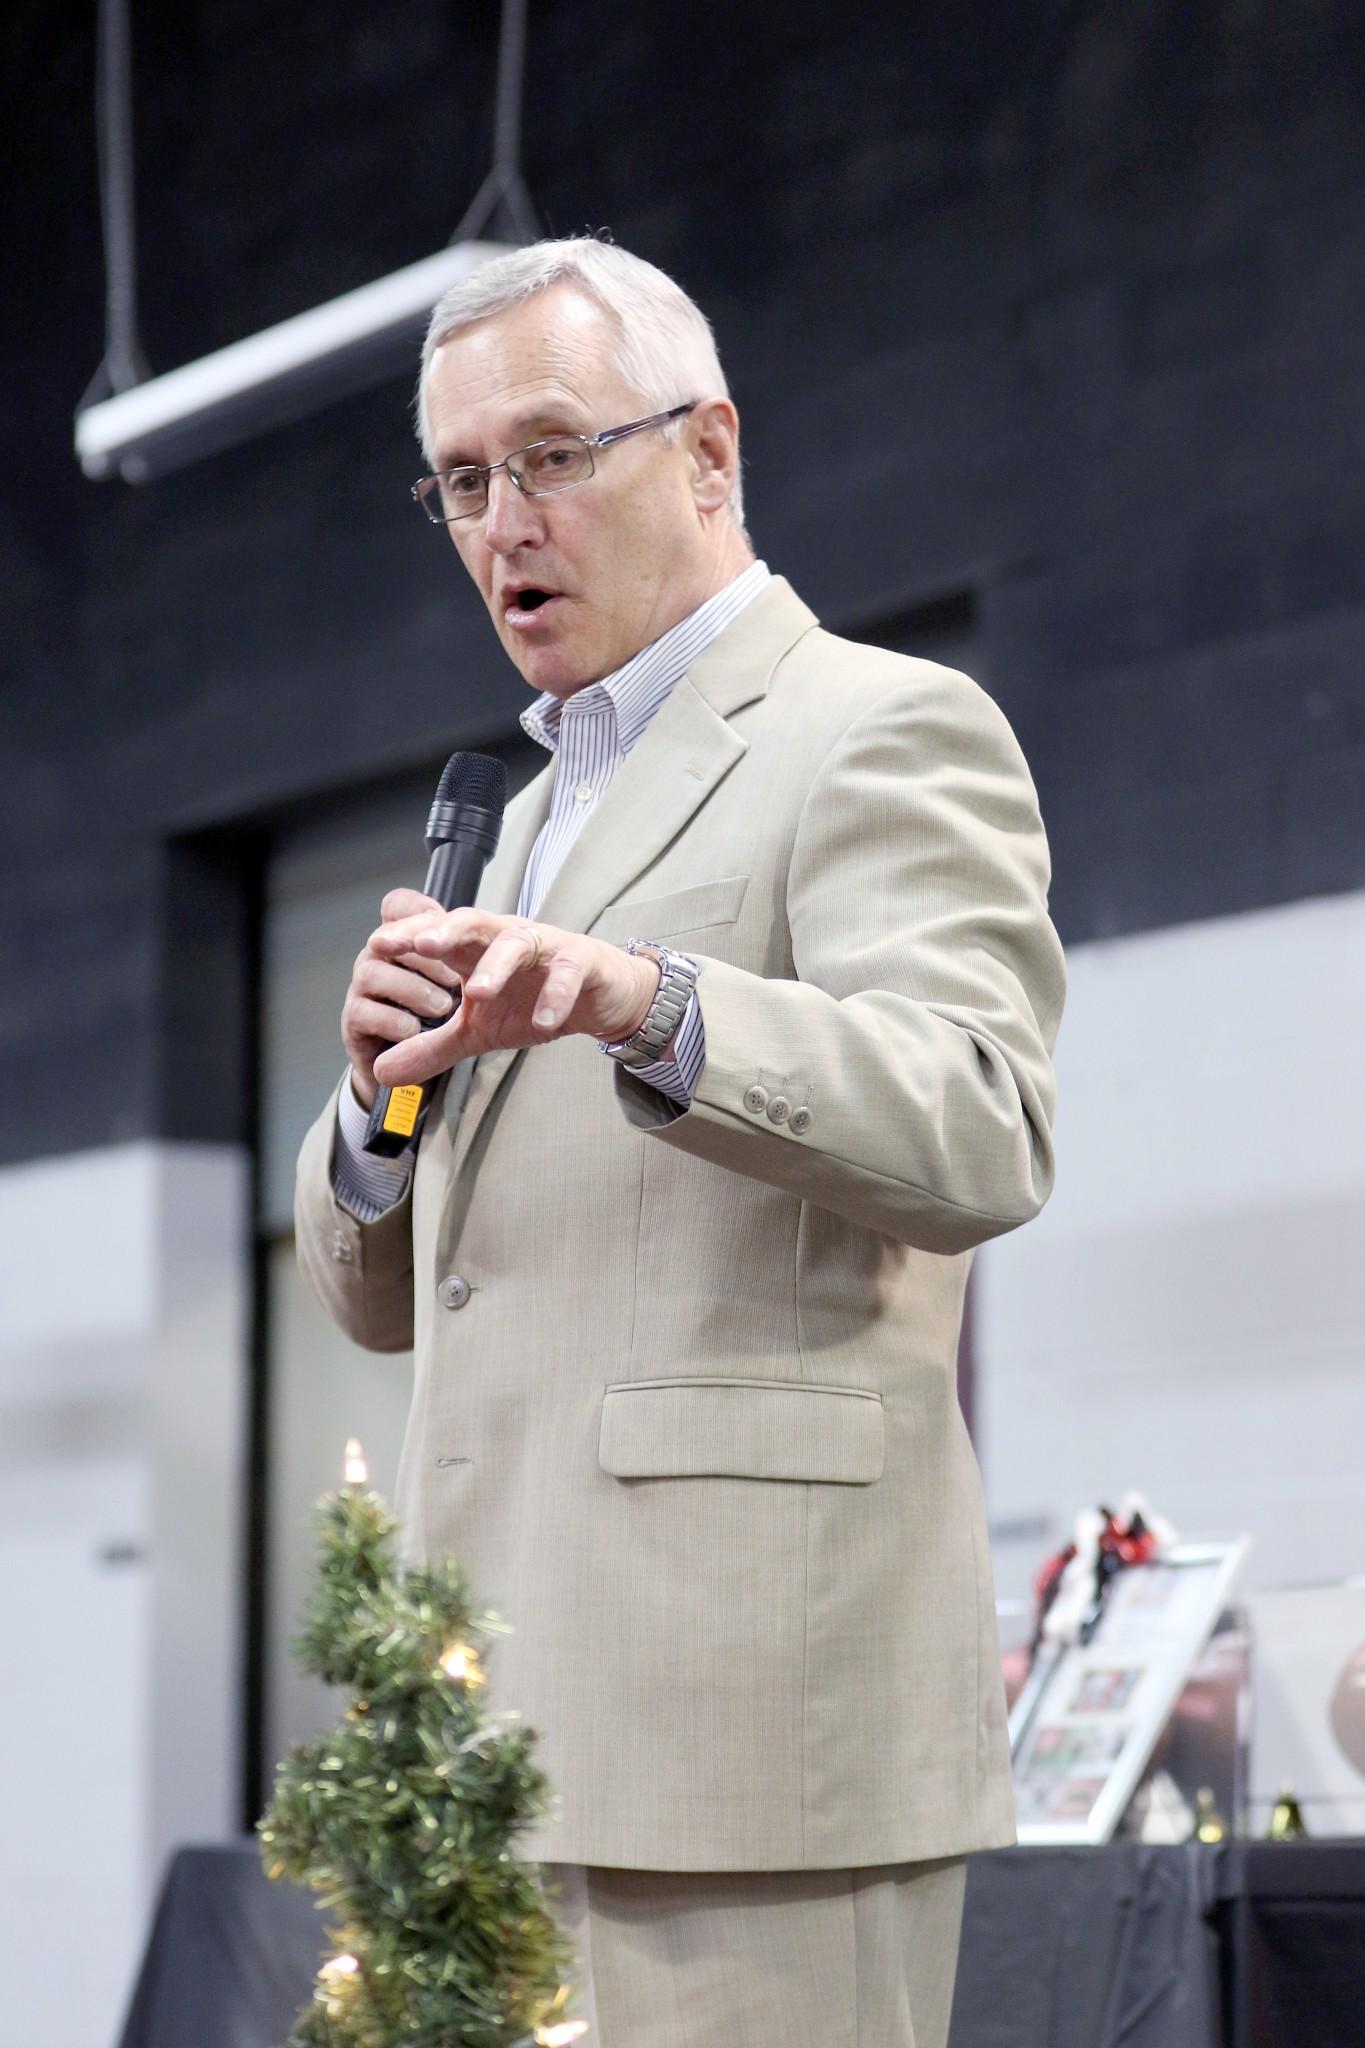 Youngstown State University President Jim Tressel. (Press file photo by Doug Hise)